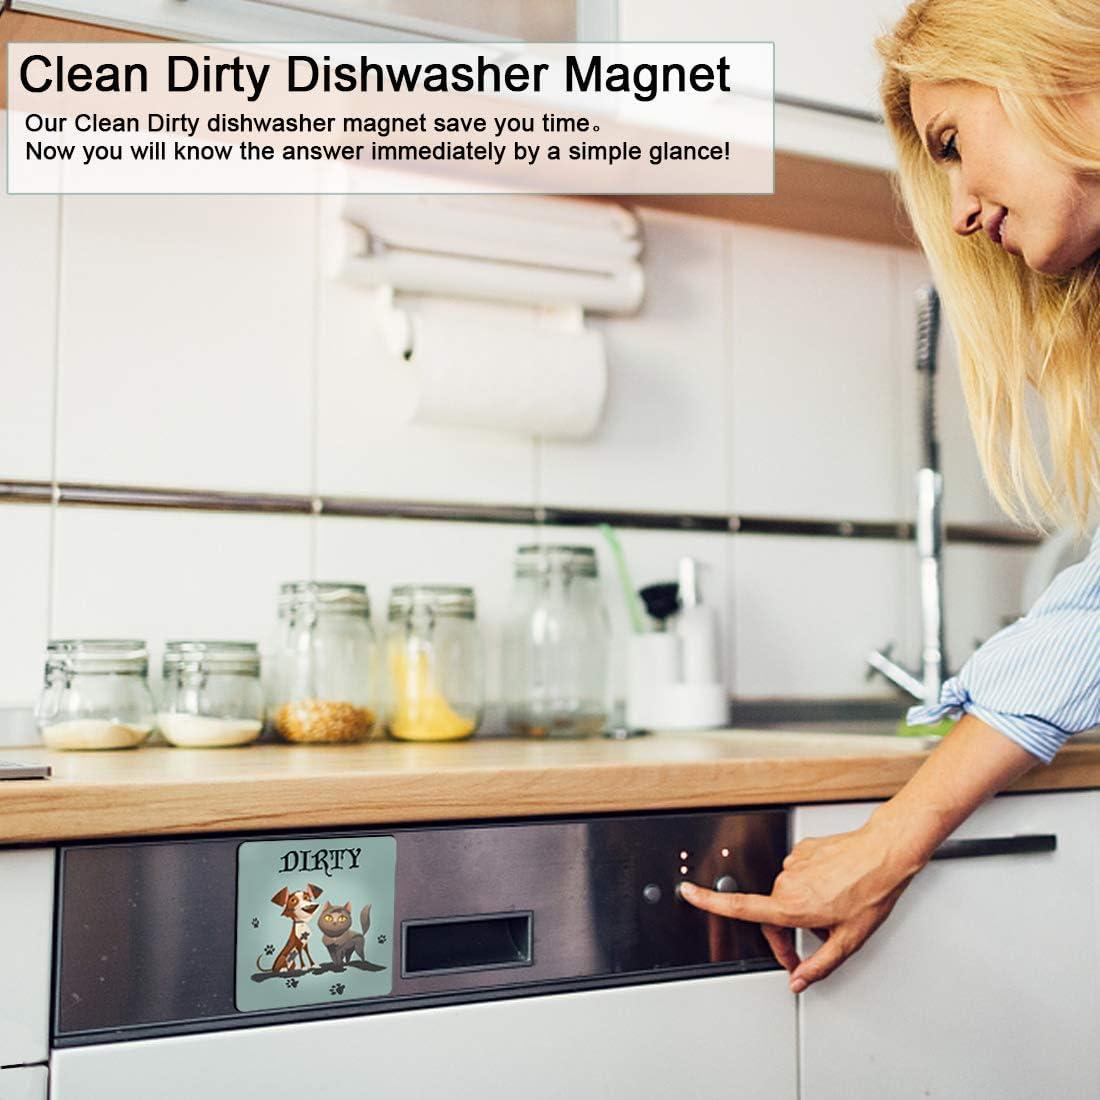 Reversible Flexible Flip Sign 4.7 x4.7 Double Sided Clean Dirty Dishwasher Magnet Waterproof UV Coating Novel Fruit Pattern Design,Kitchen Addition Premium Flip Sign Indicator Fruit